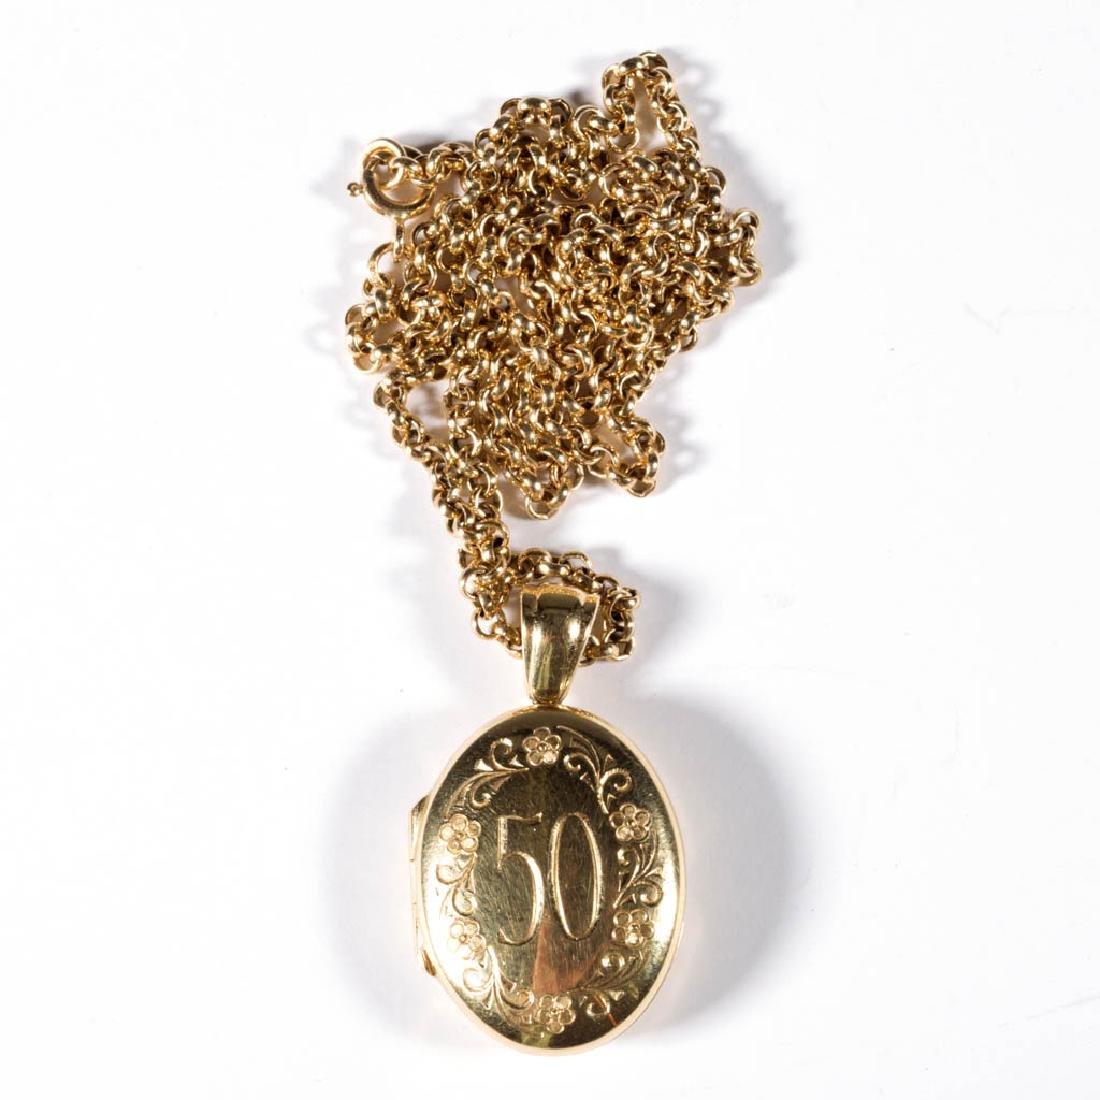 VINTAGE 18K GOLD LOCKET AND 14K GOLD CHAIN